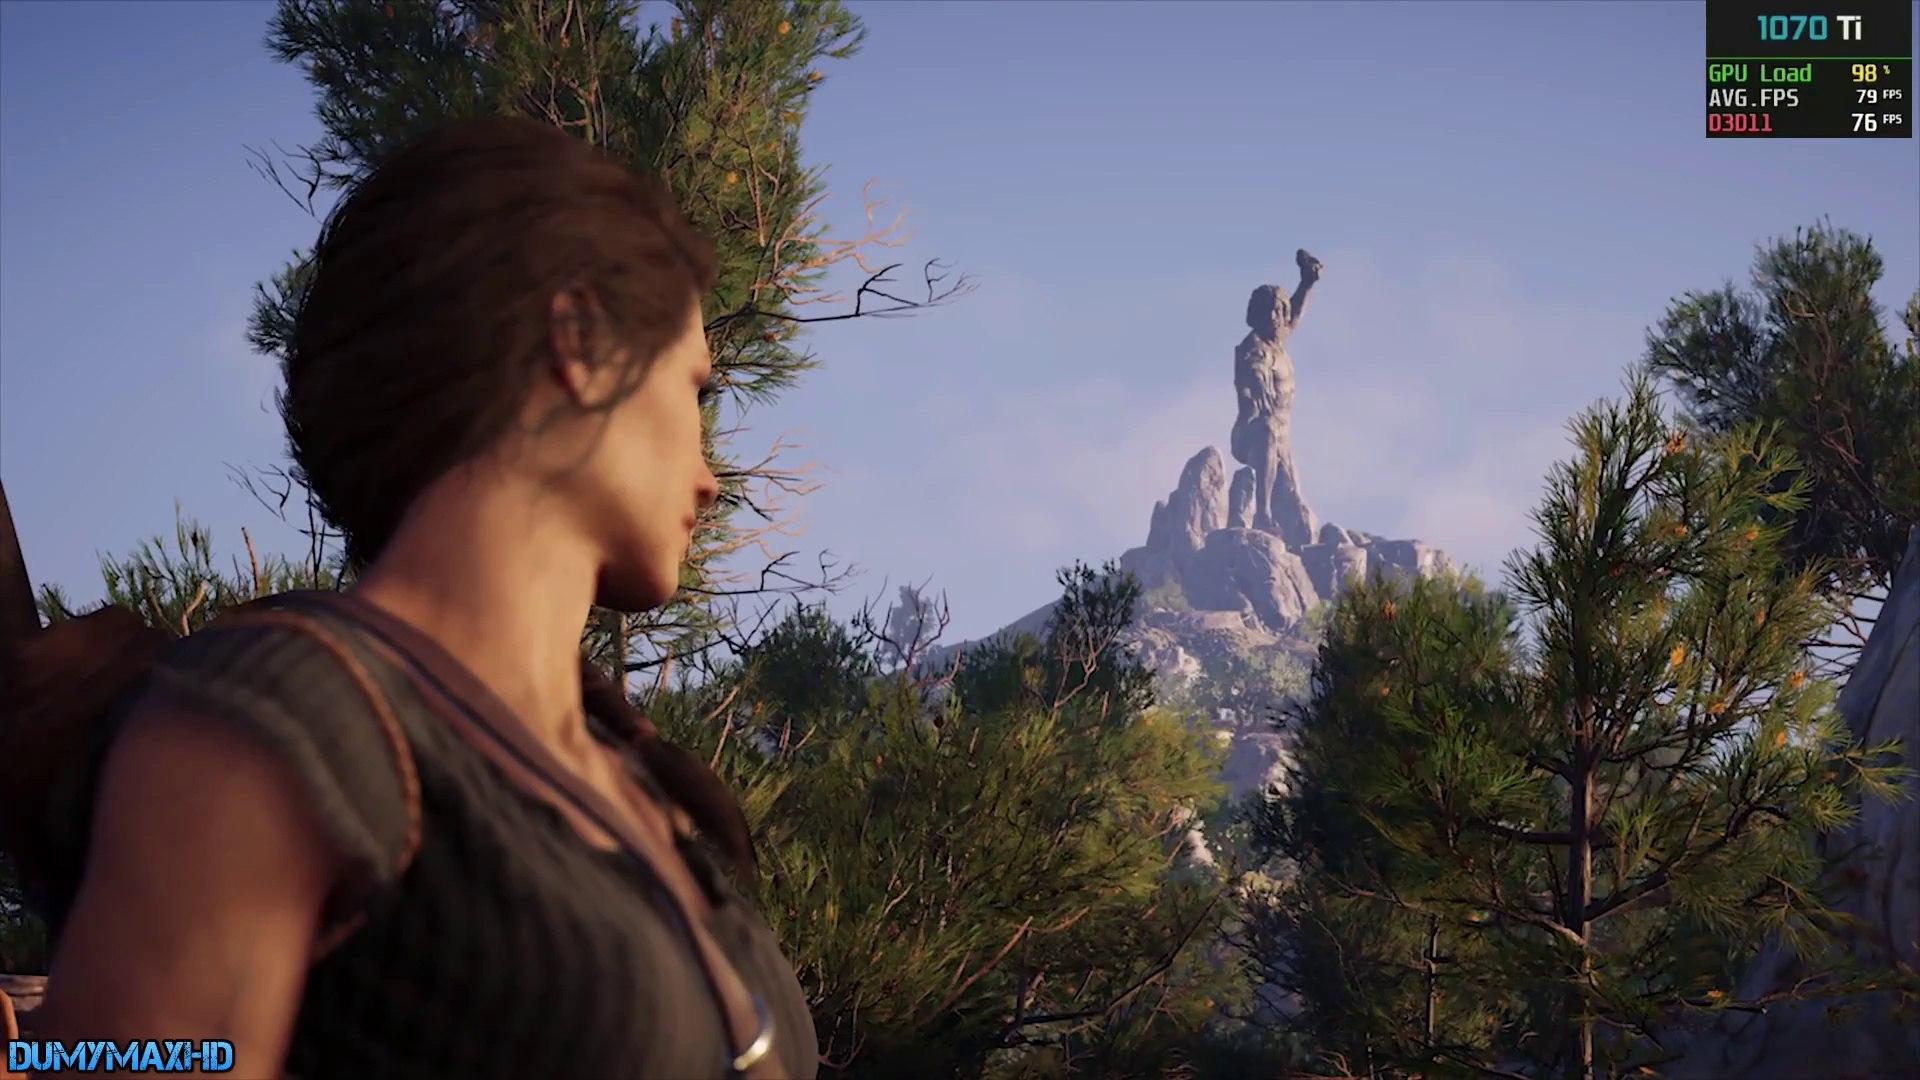 Assassin's Creed Odyssey i7 7700 16GB RAM GTX 1070 Ti MSI GAMING (PC)